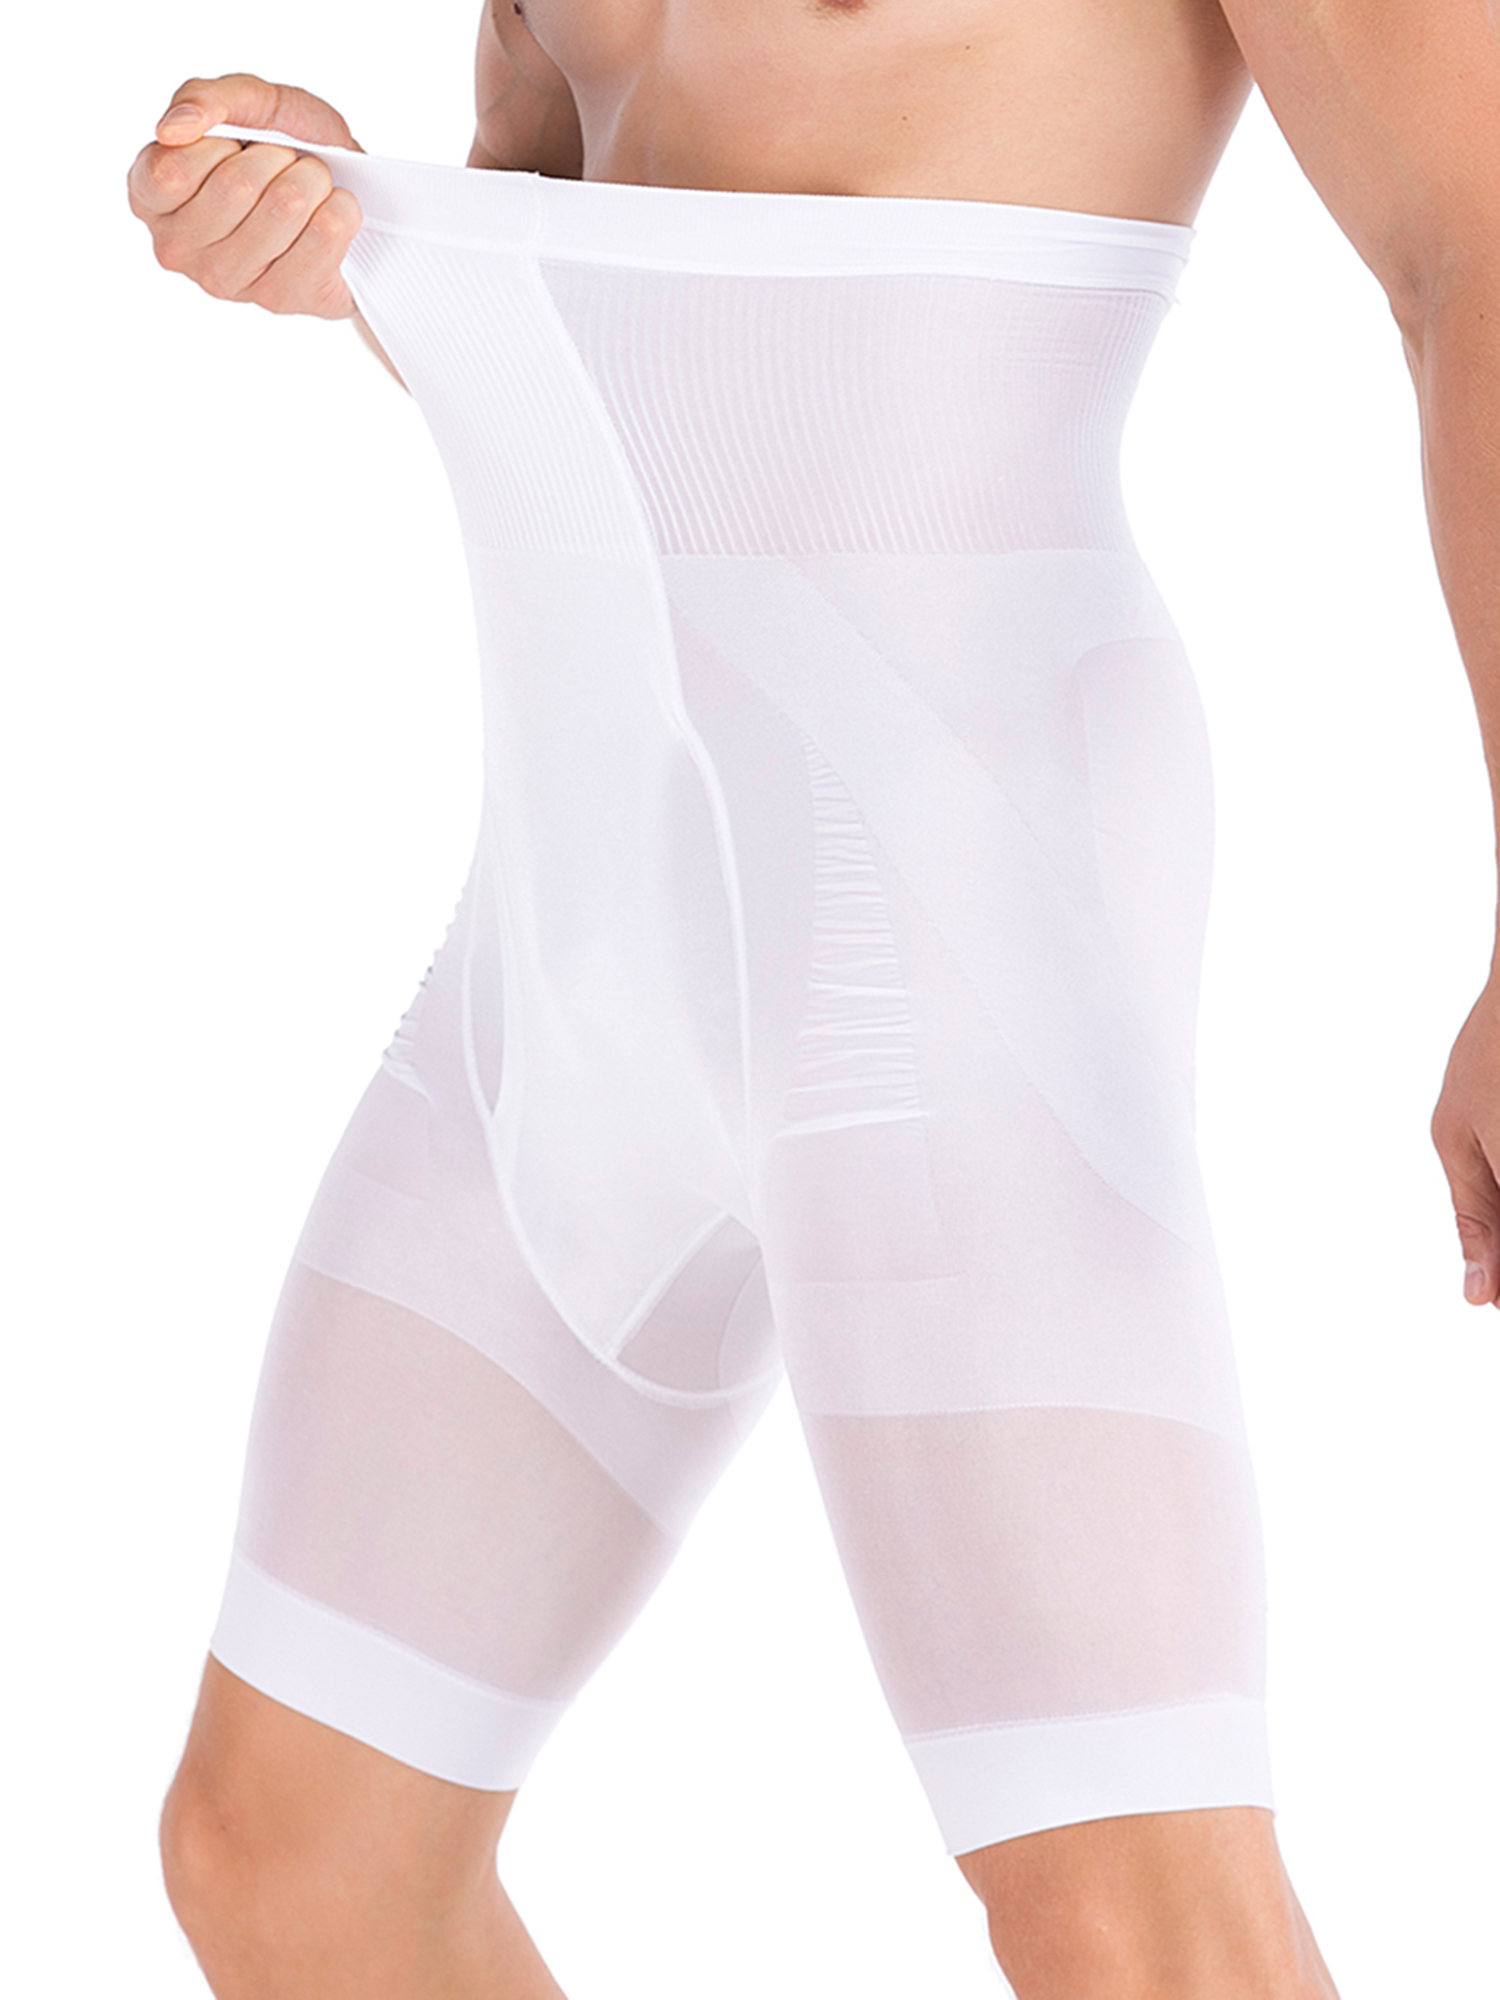 Mens ummy Control Slimming Shapewear Body Shape T Shorts High Waist Abdomen Slim